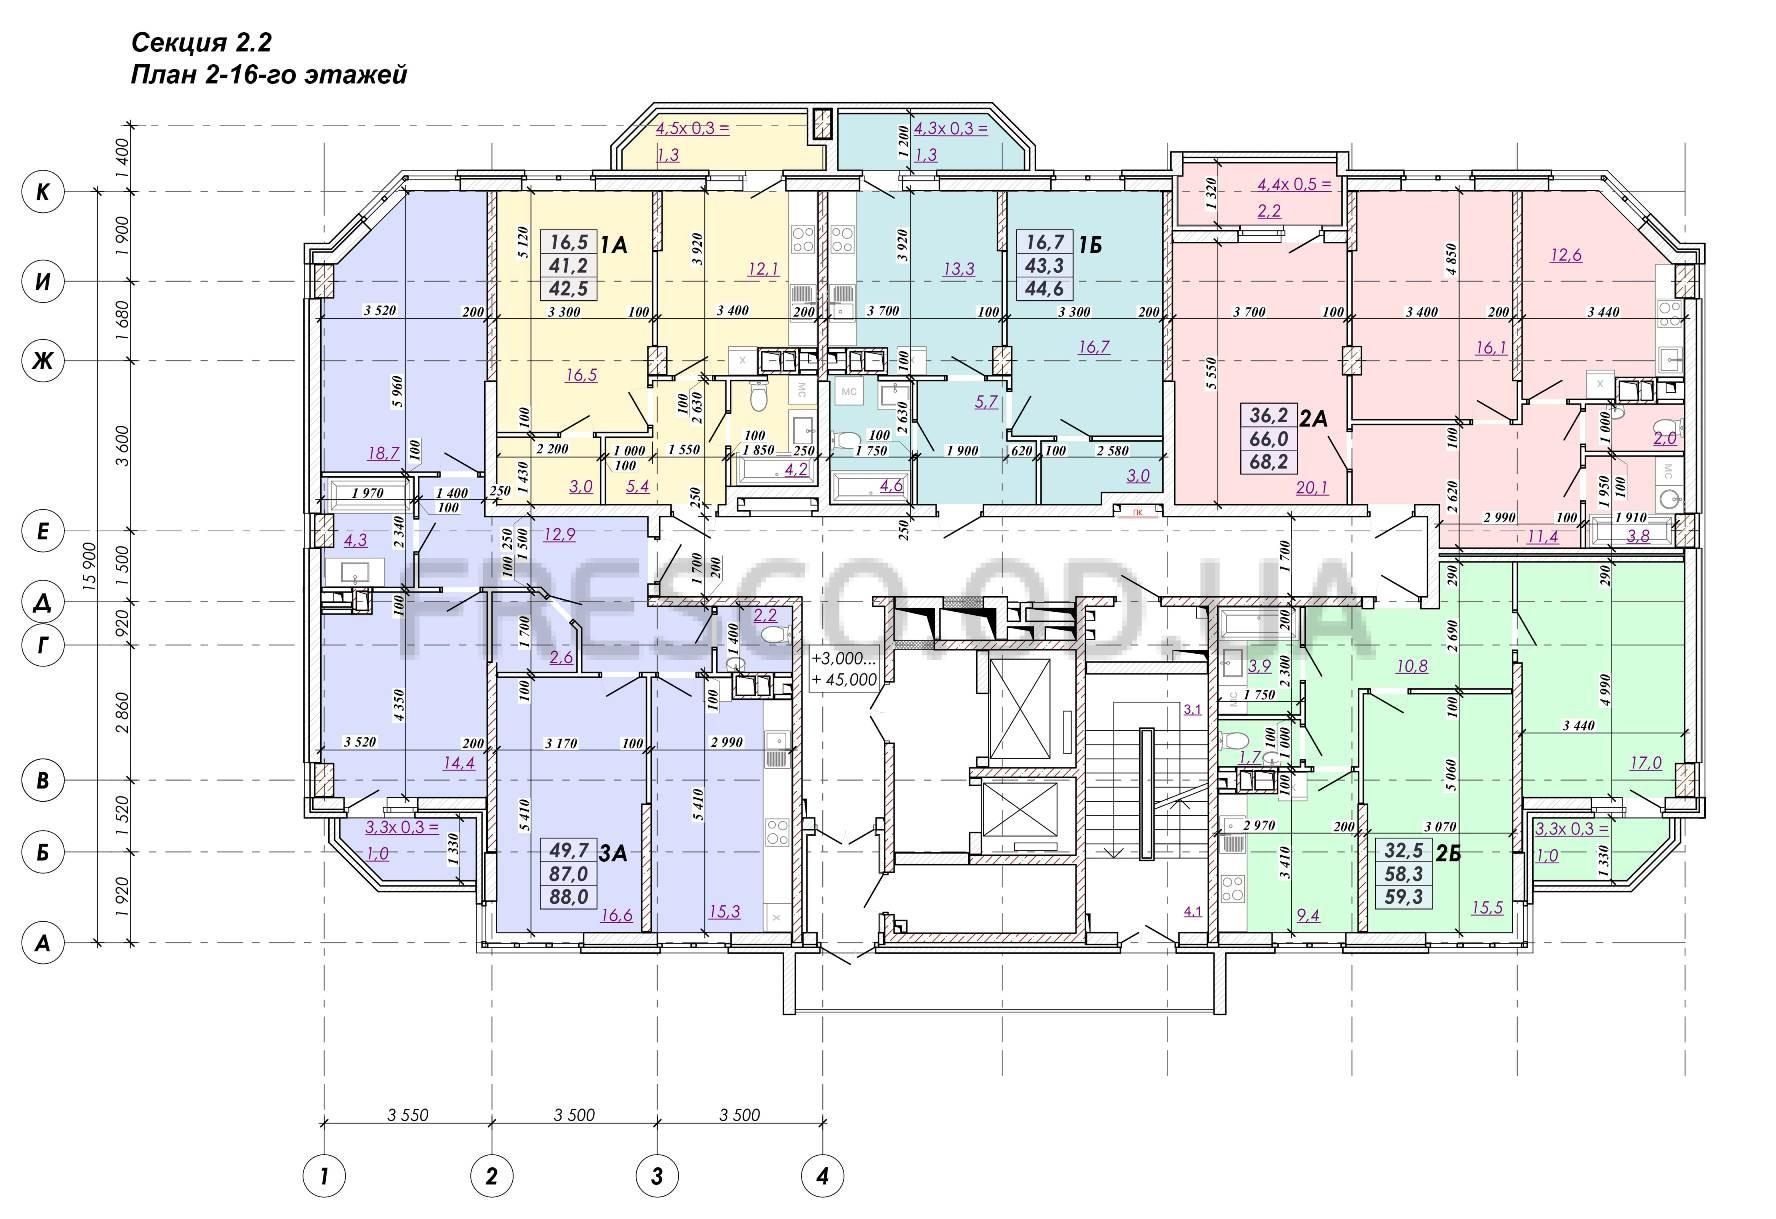 ЖК RealPark (Реал Парк) секция 2.2 план 2-16 этажа